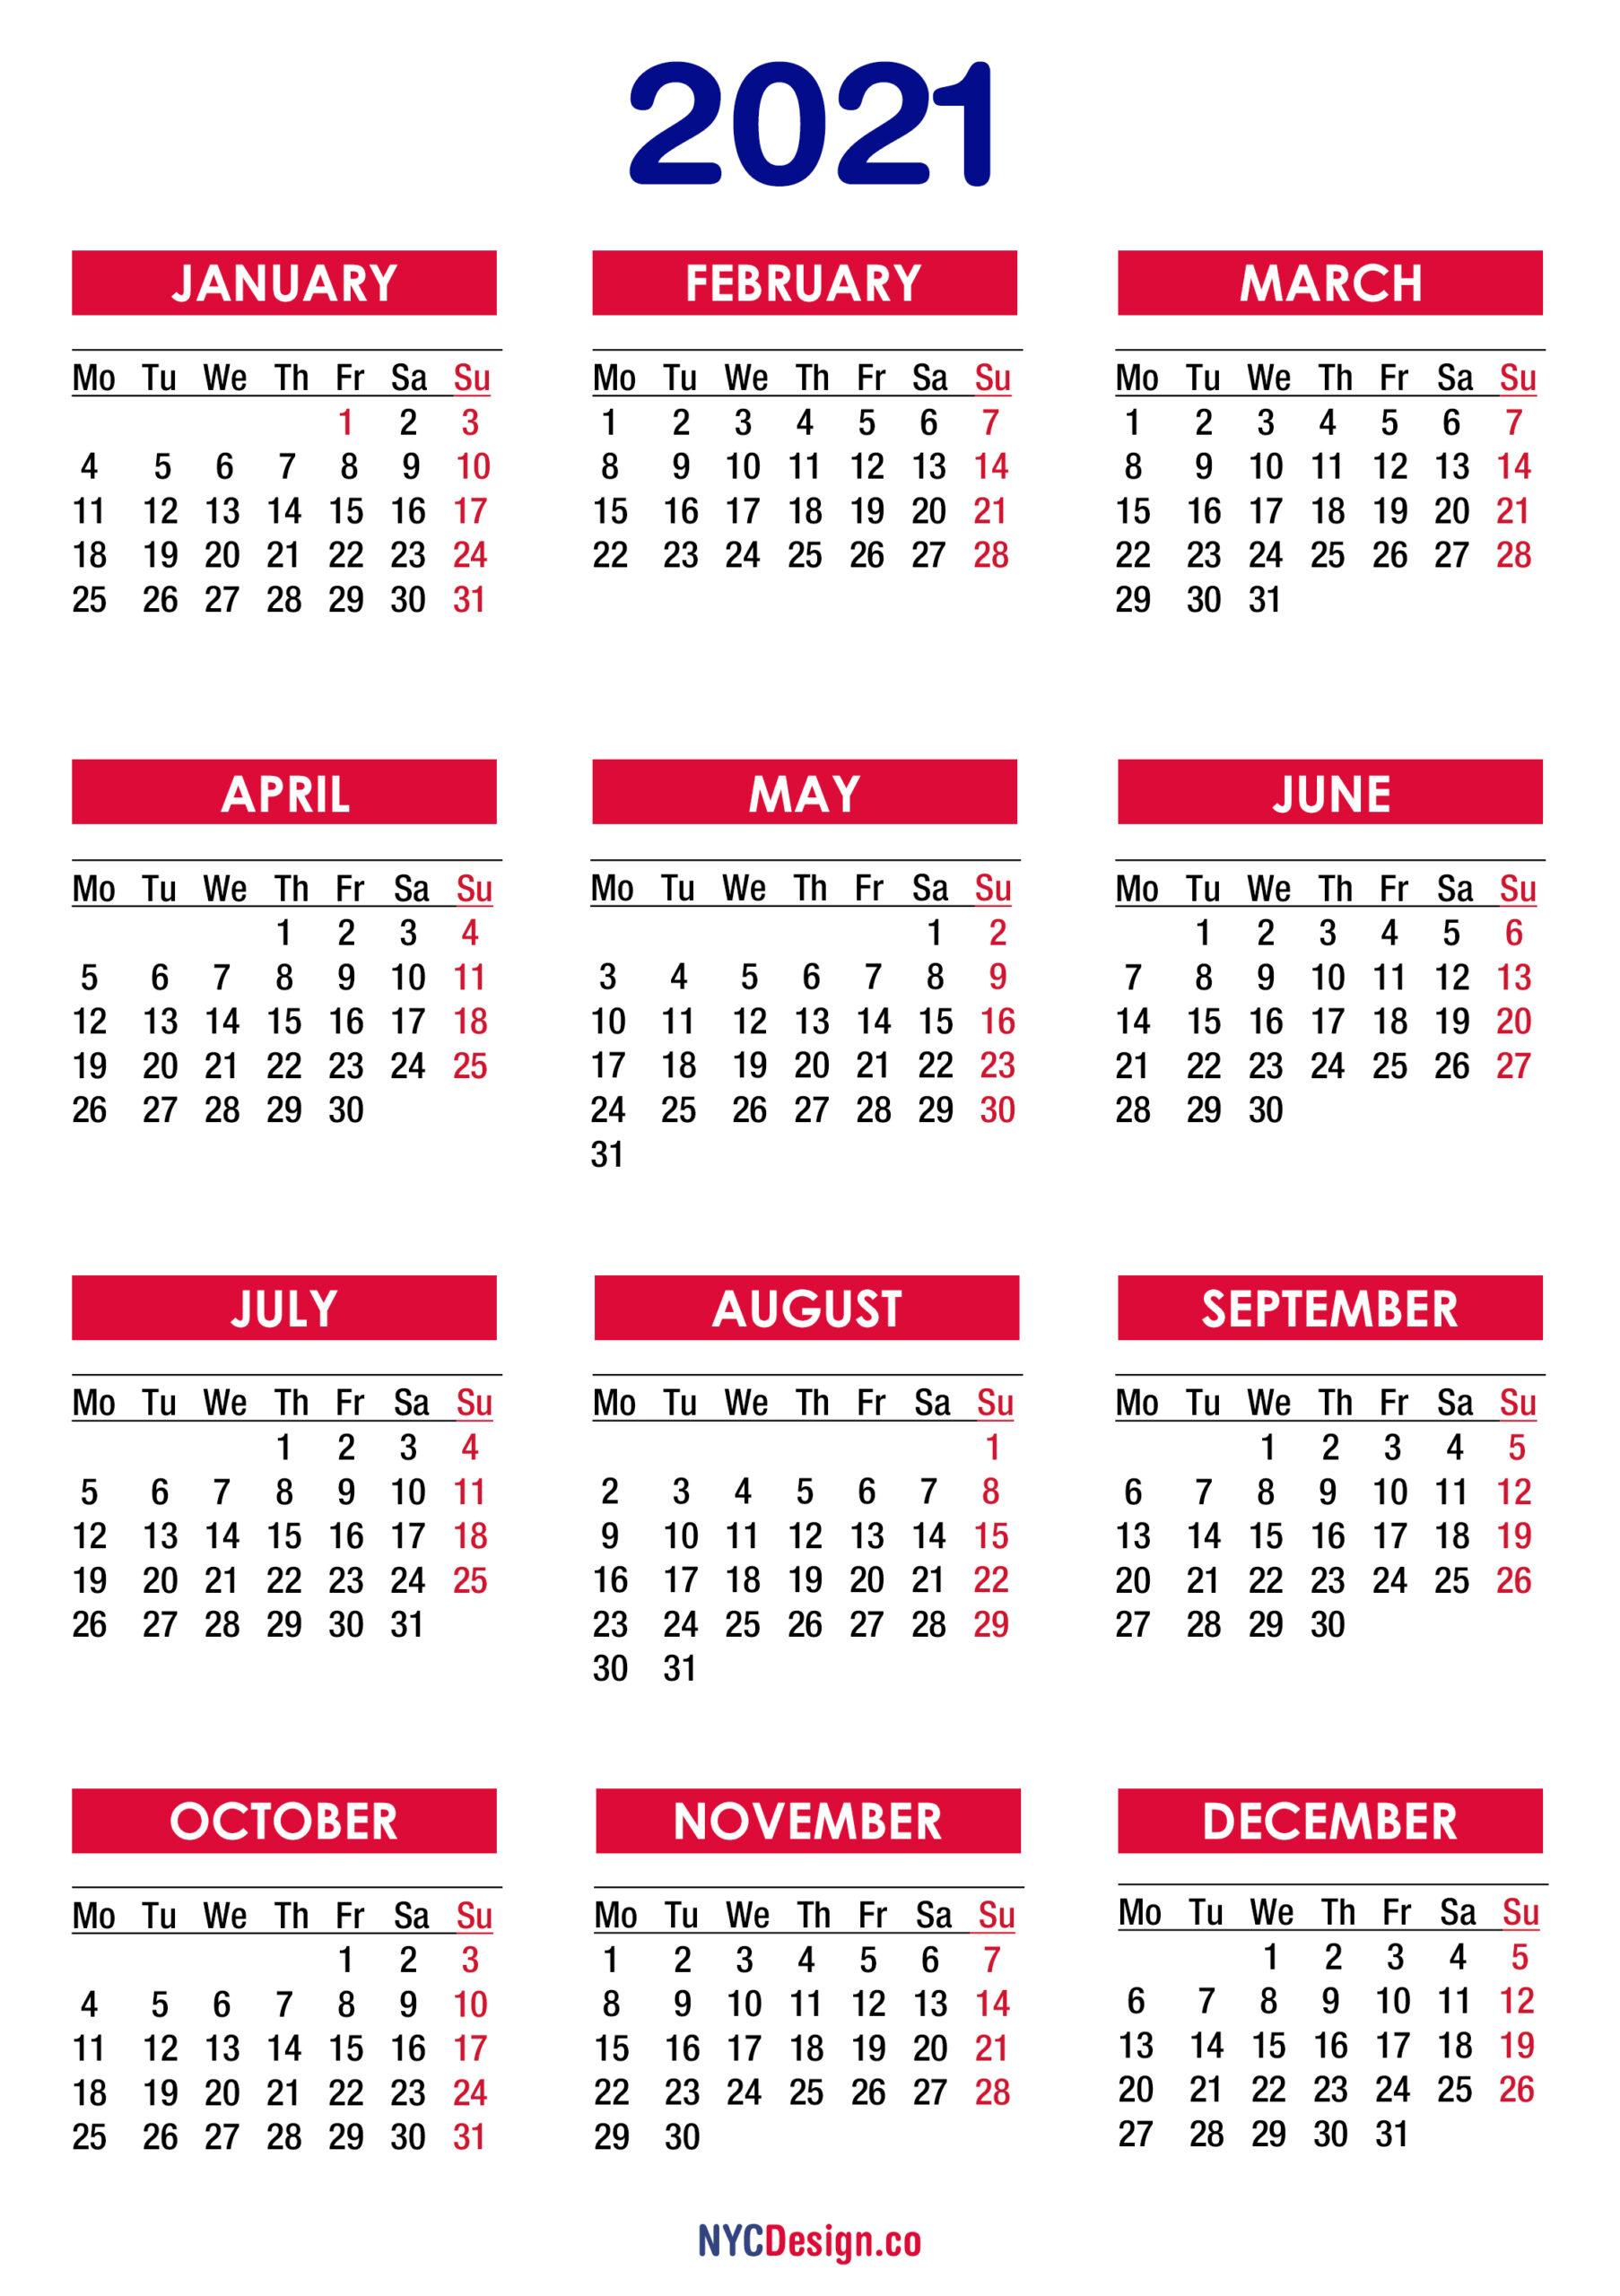 2021 Calendar Printable Free, Pdf, Colorful - Monday Start